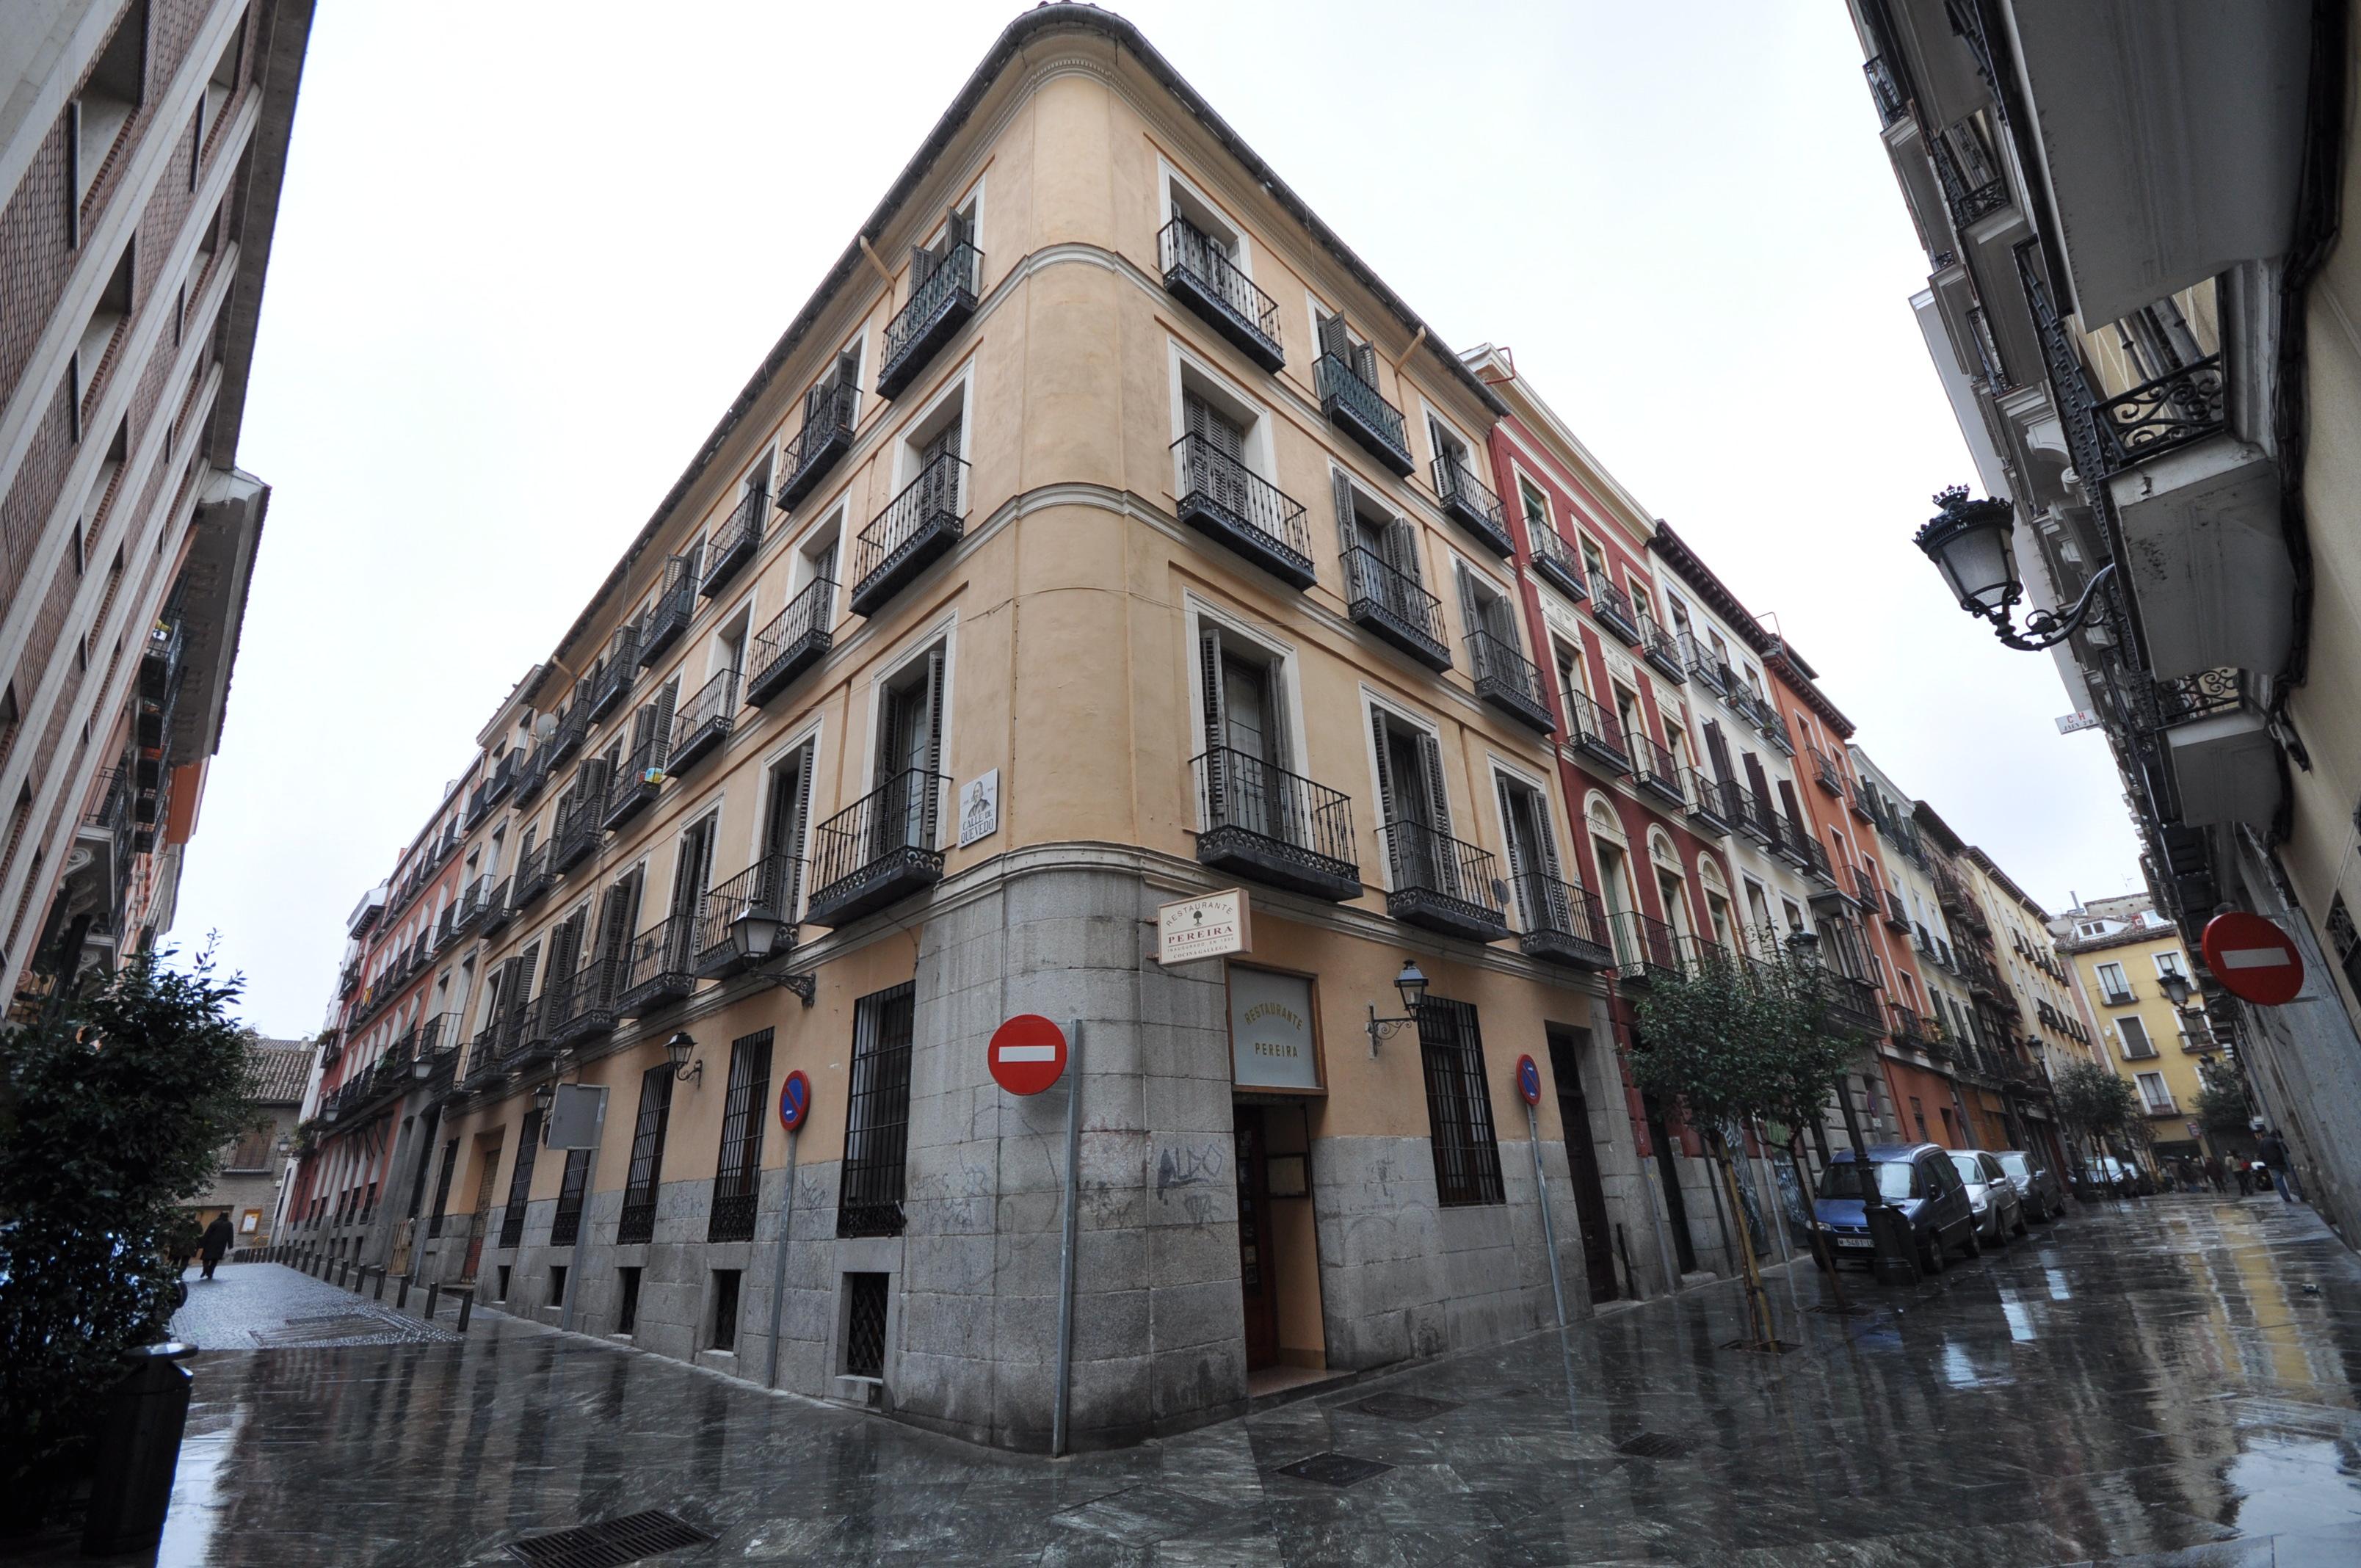 File:Barrio de las Letras (Madrid) 01.jpg - Wikimedia Commons